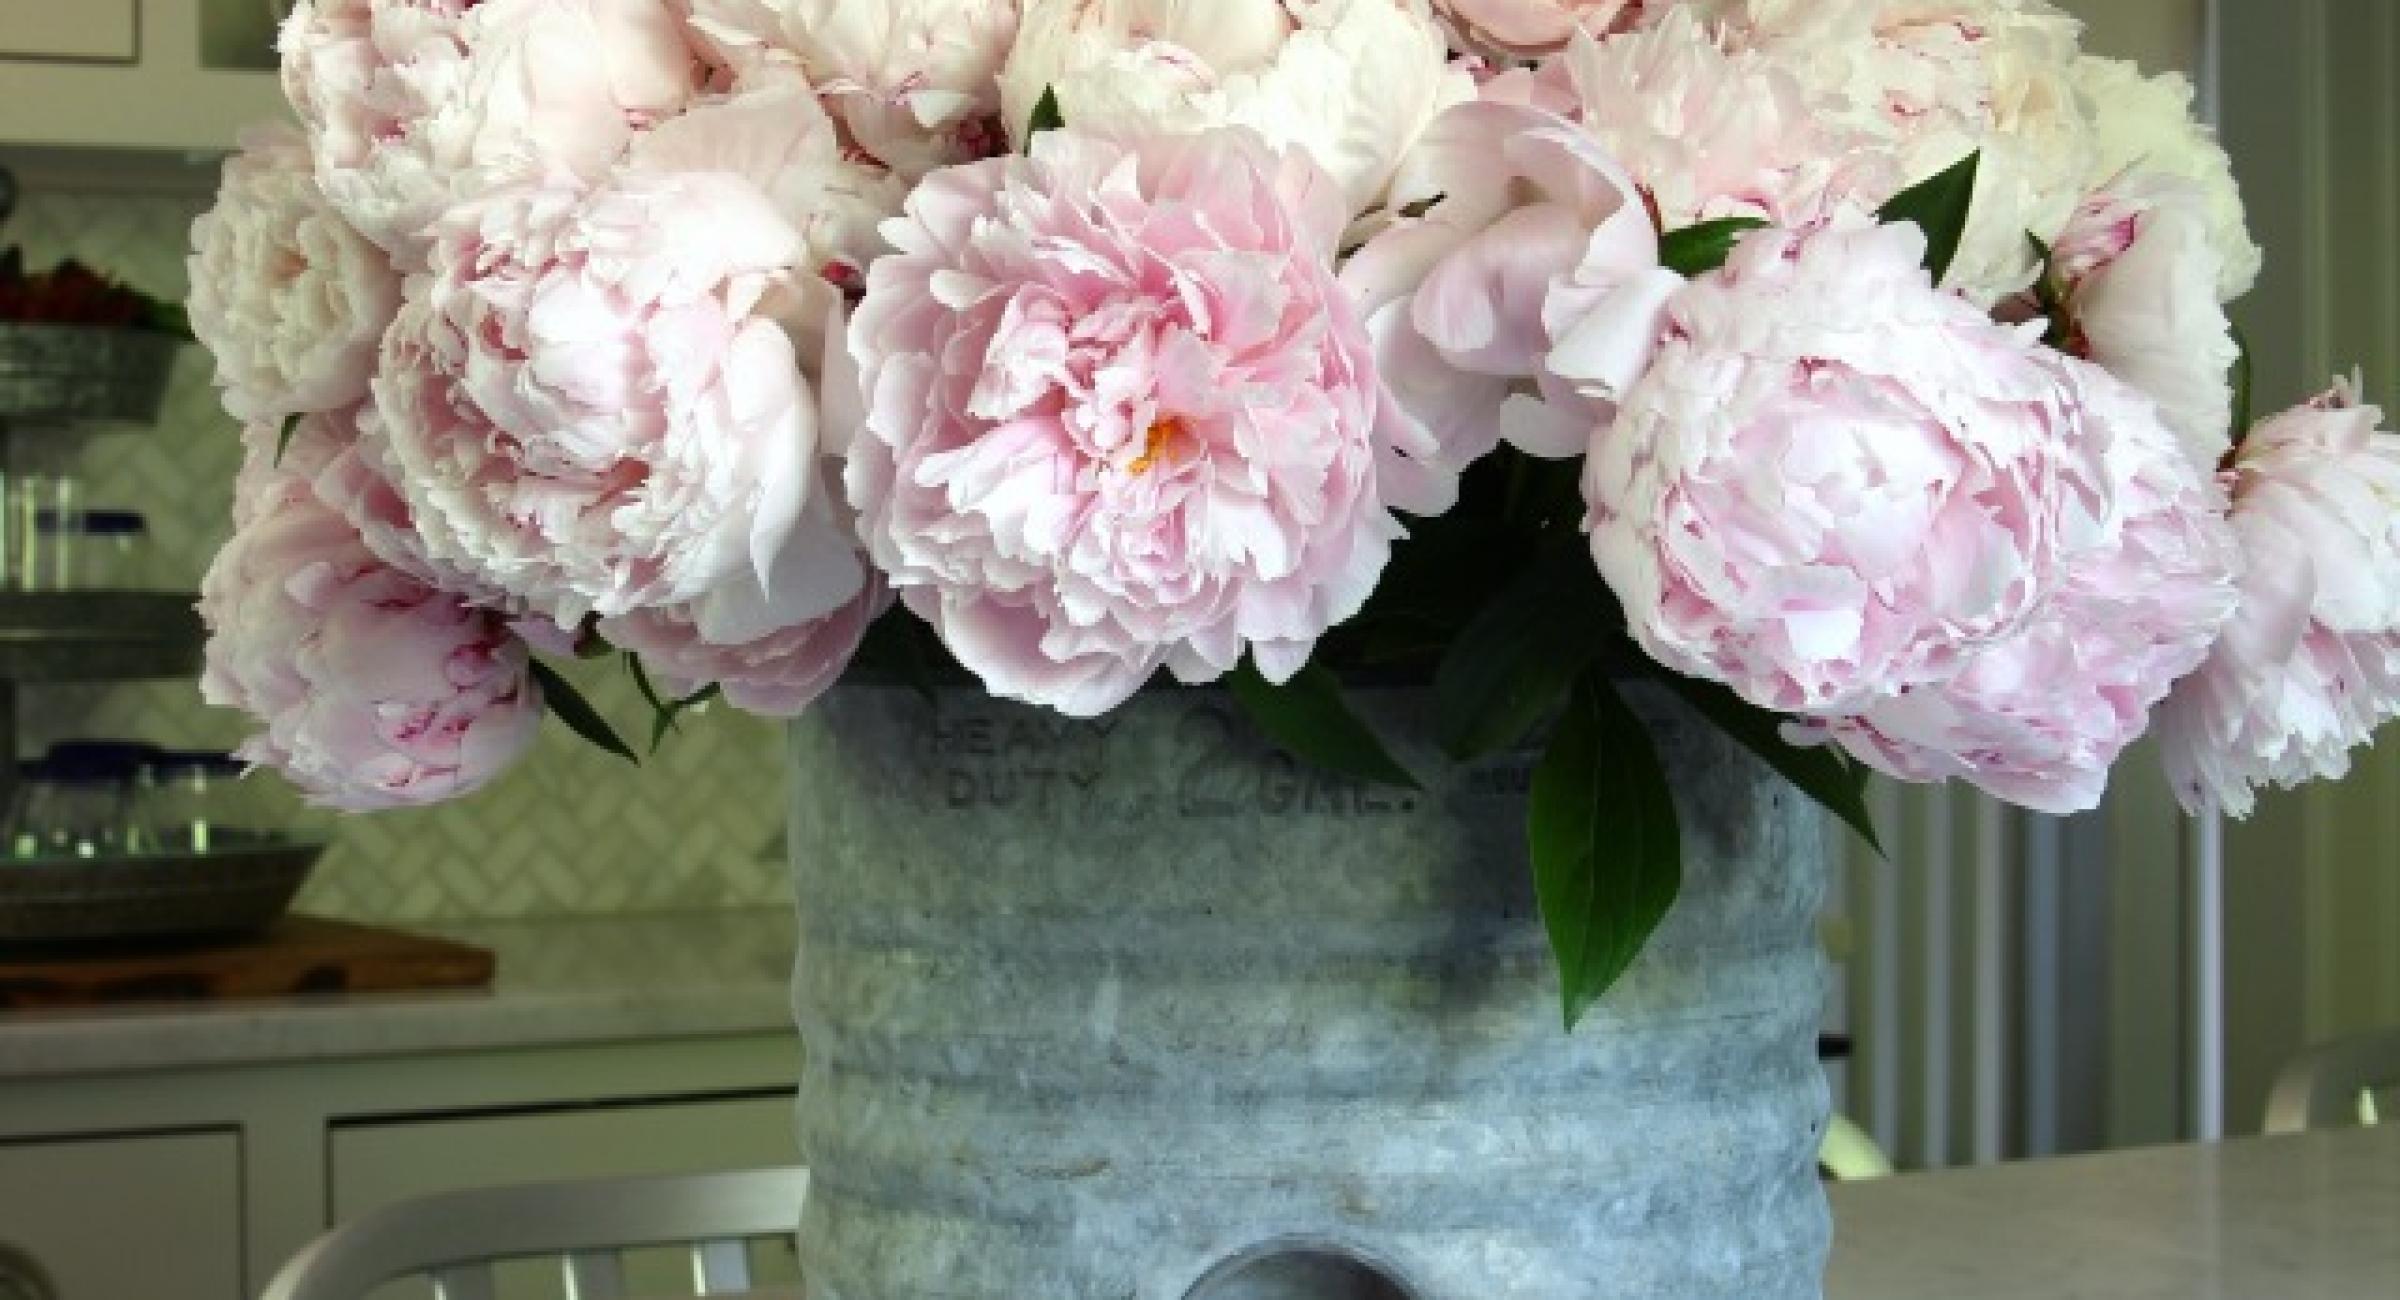 Pink peonies in vintage galvanized water cooler kellyelko.com